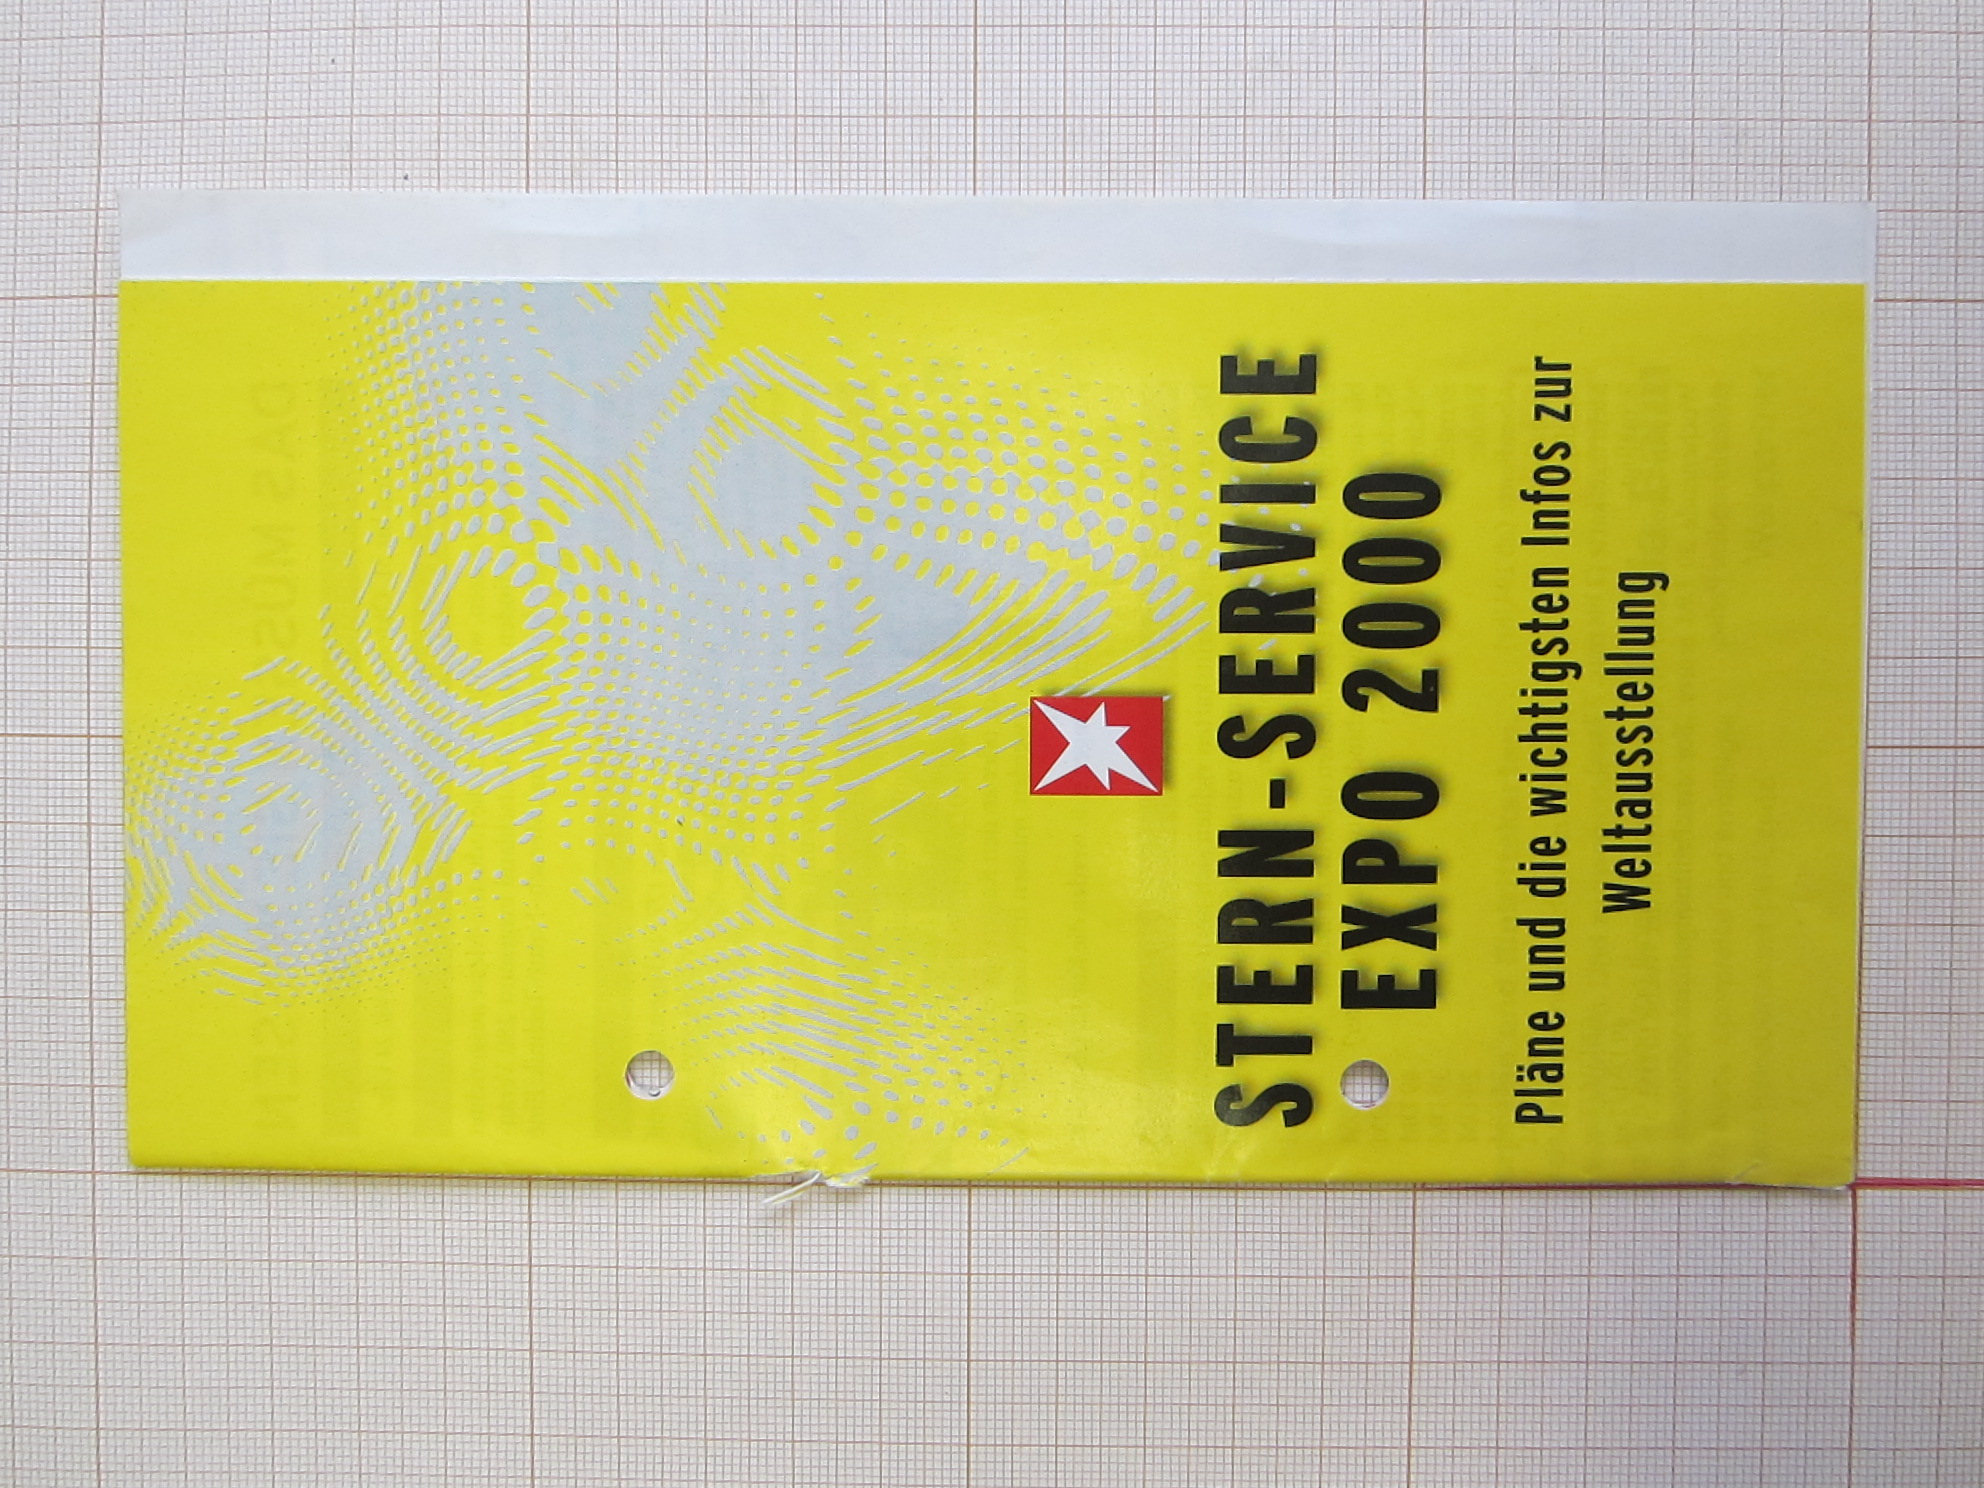 Stern-service expo 2000© François Schuiten, 2000